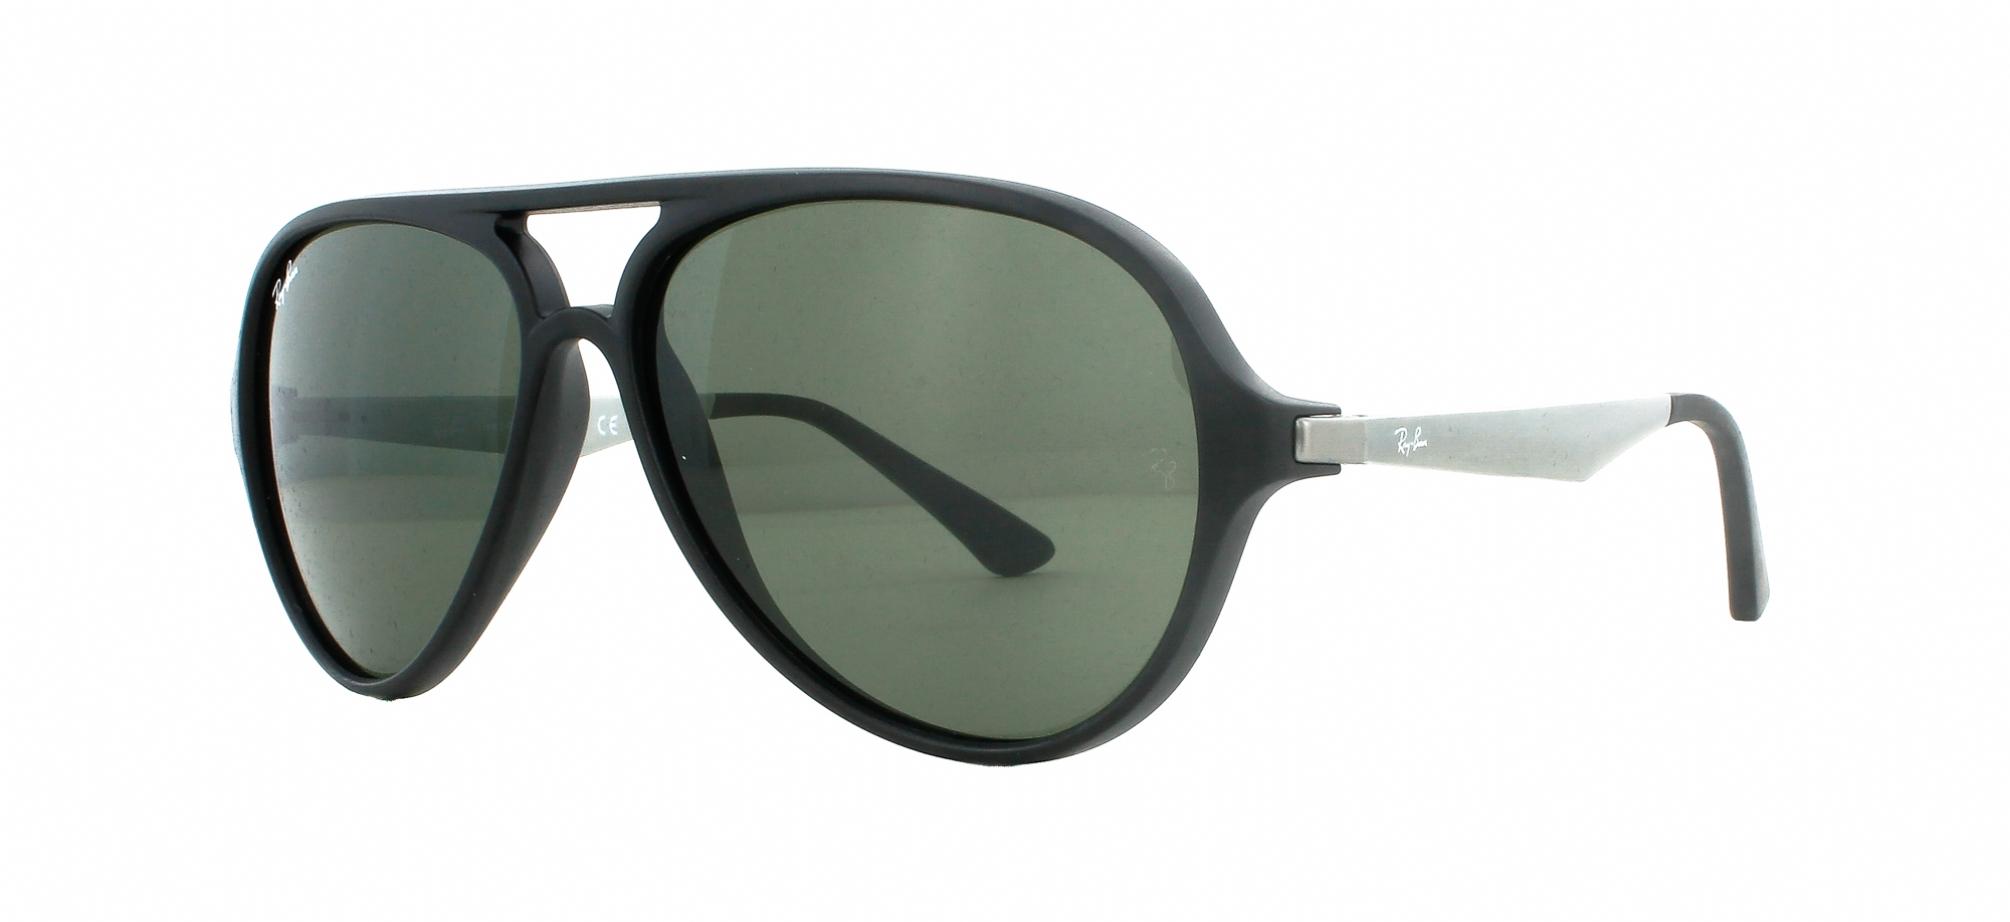 2d7f1e65b8 Ray Ban 4235 Sunglasses